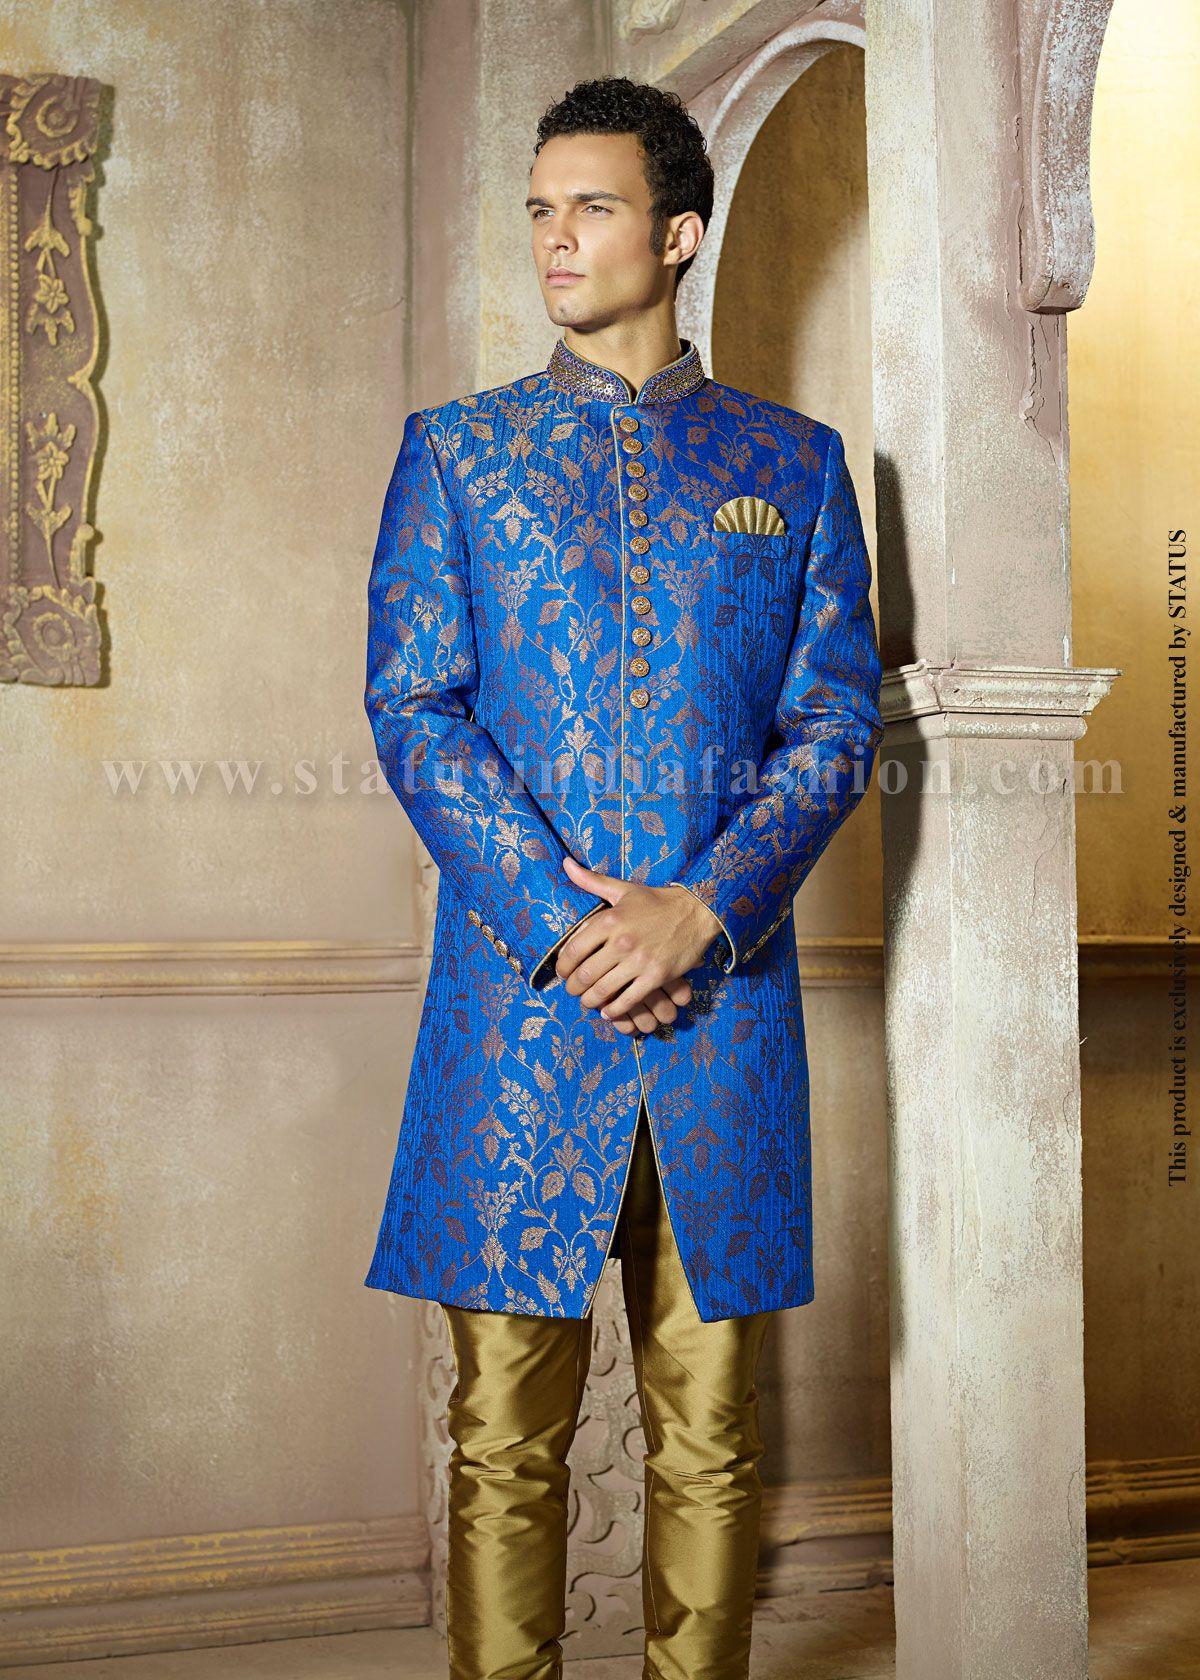 Velvet sherwani, indian wedding wear, groom sherwani, best